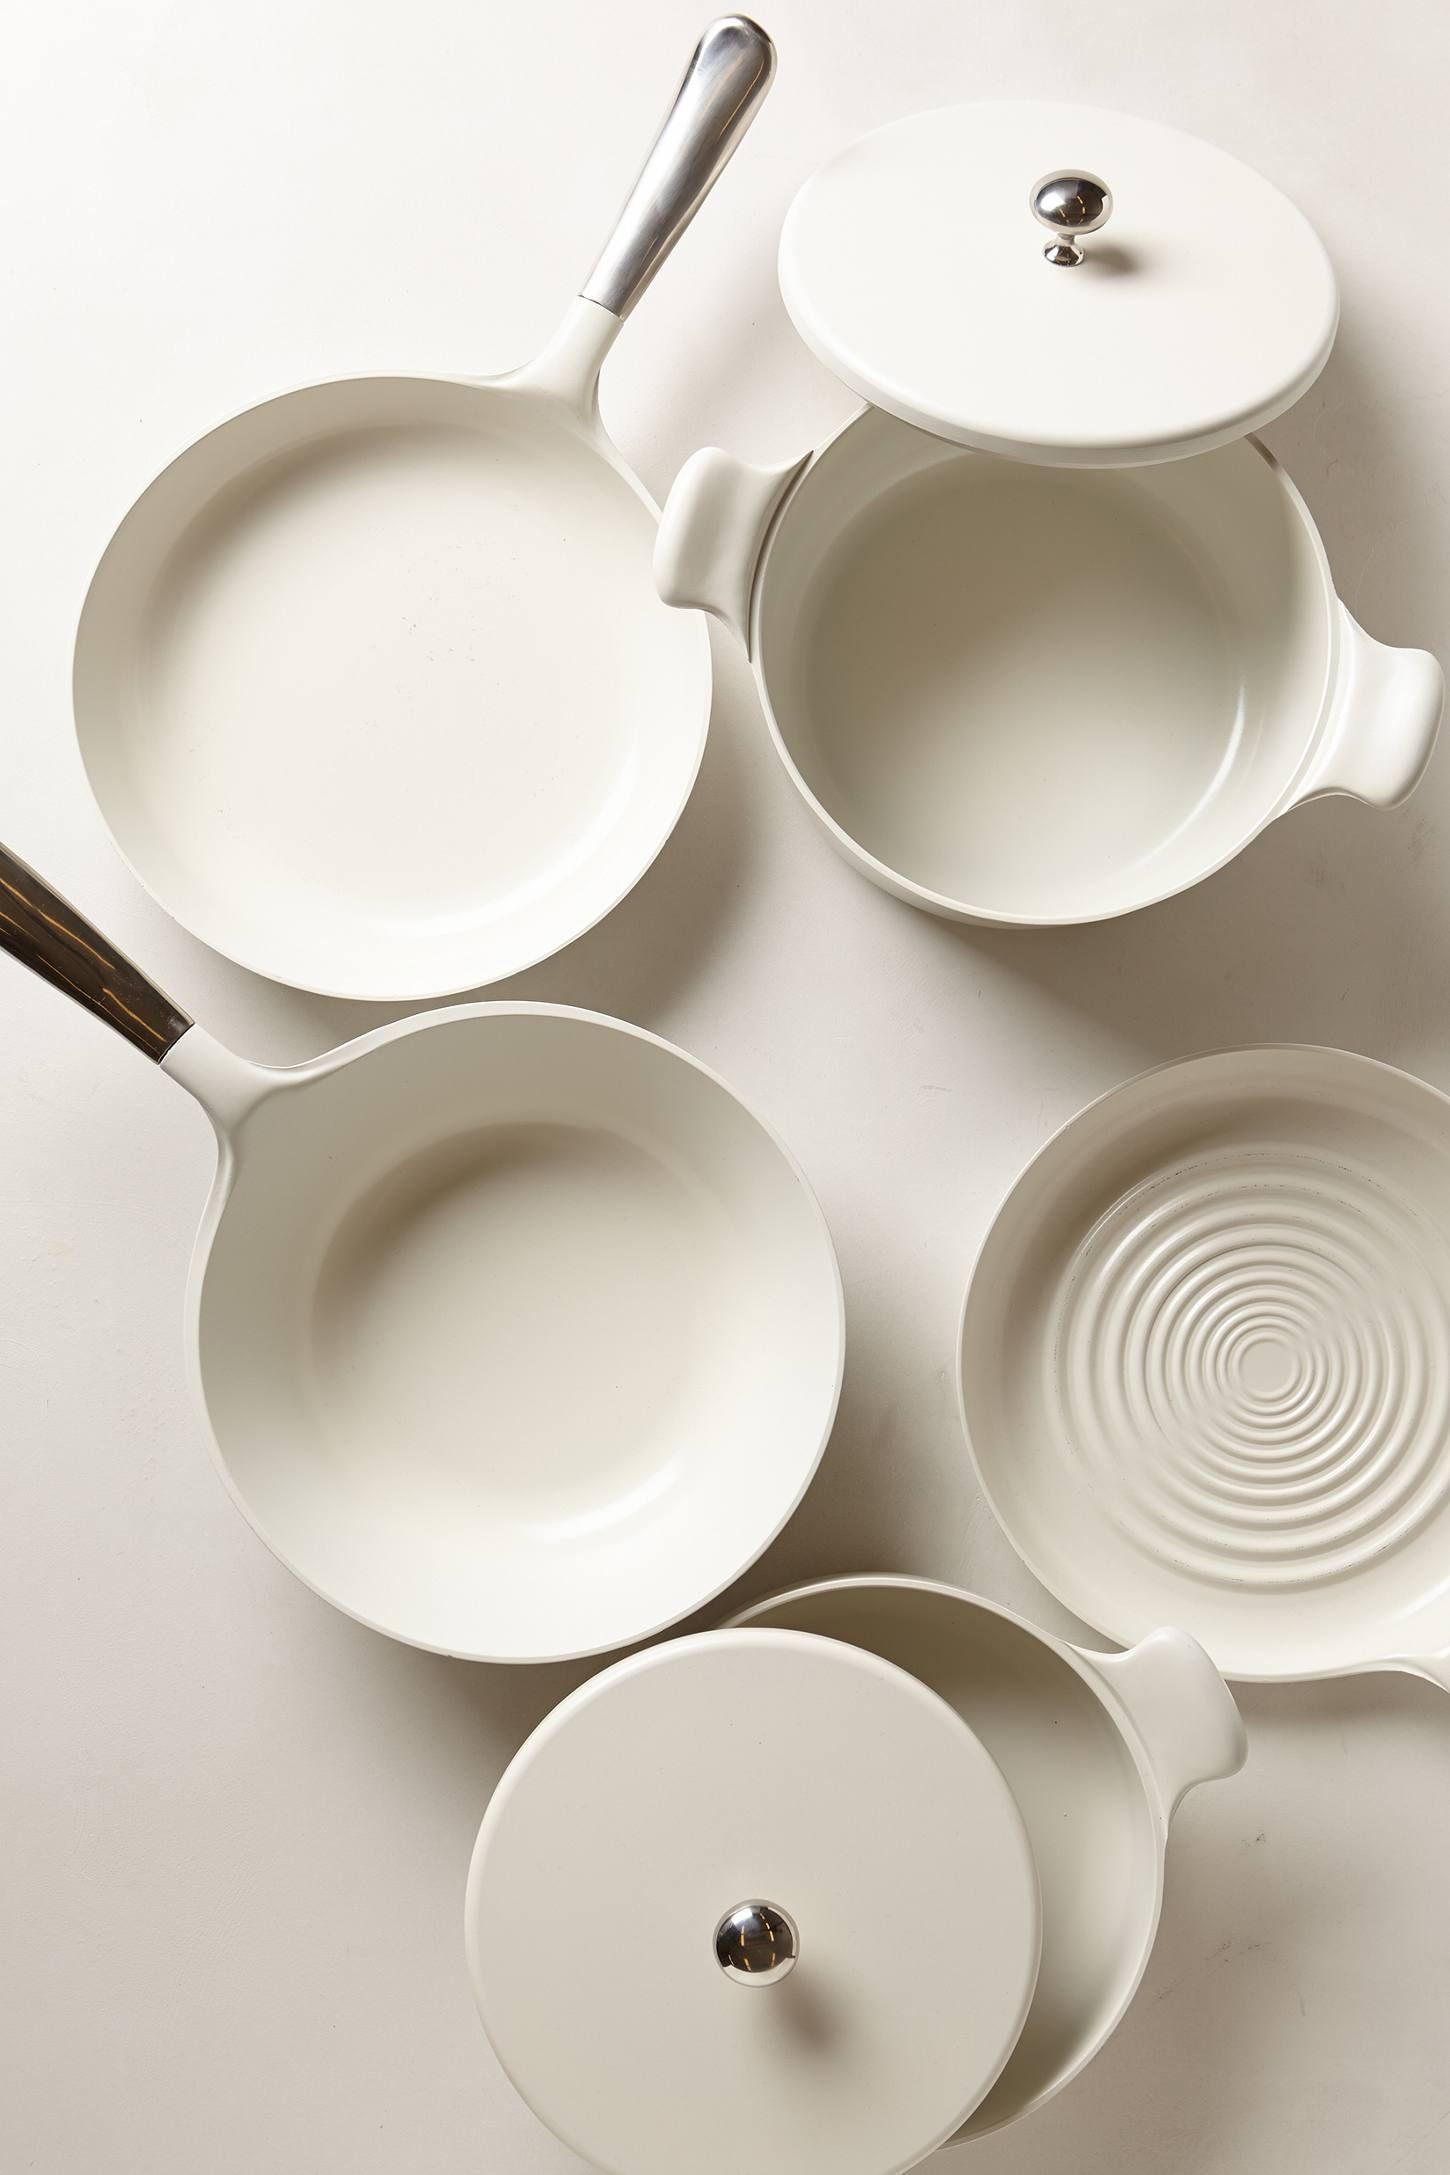 Ceramic Coated Cookware Anthropologie Com Kitchen Items Tableware Ceramics